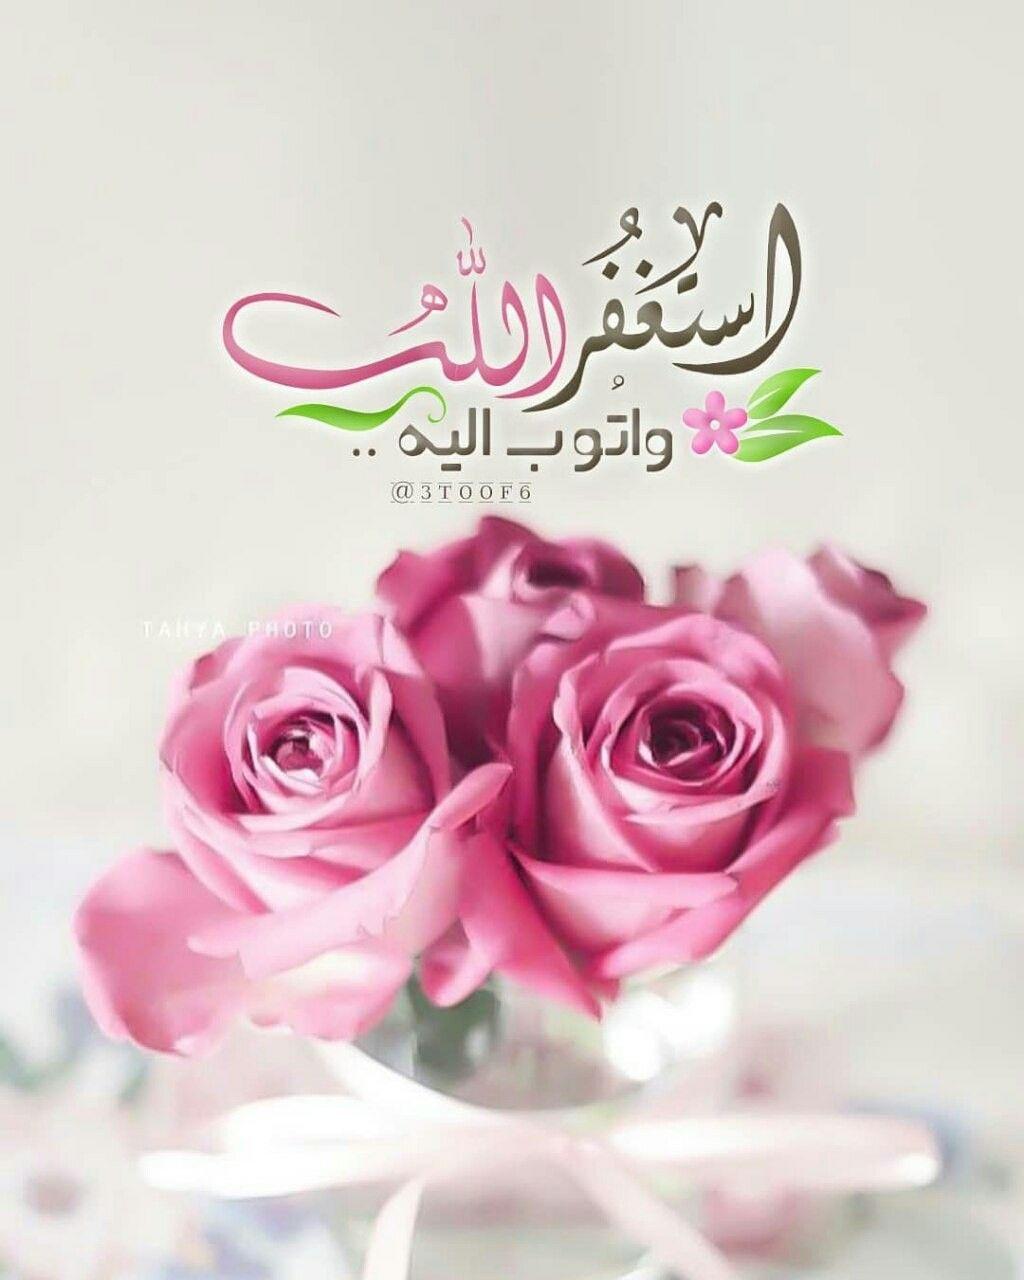 Pin By Reham ắli On أجيب دعوة الداعي Trending Decor Islamic Pictures Paper Background